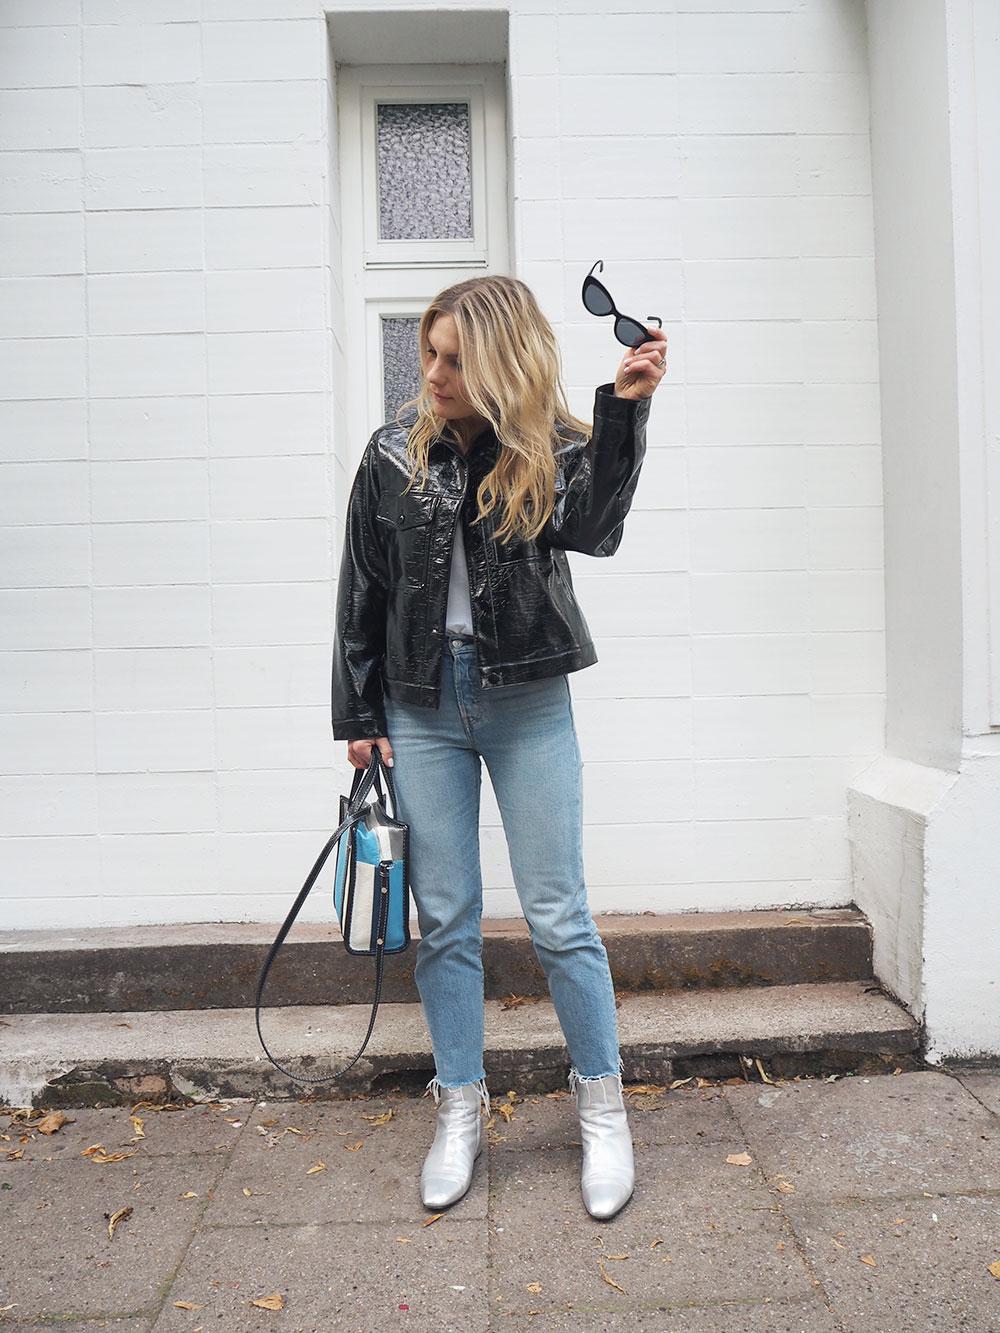 RosyCheeks-blog-Monki-vinyl-jacket-levis-wedgie-jeans-aeyde-naomi-boots